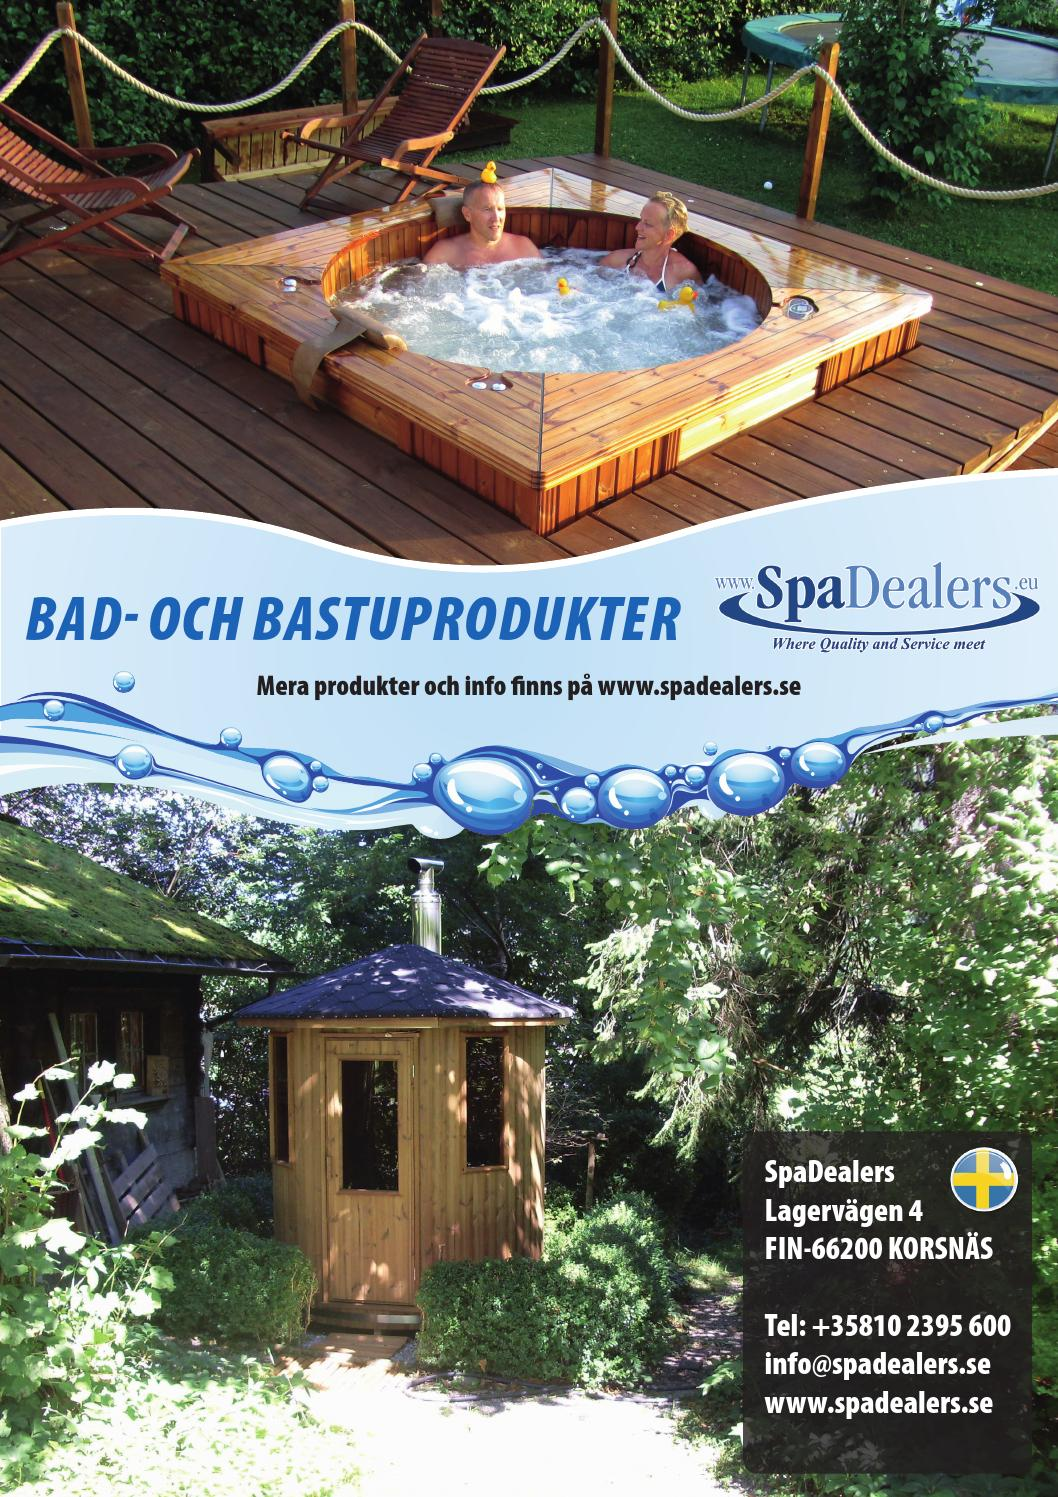 Nordpeis katalog 2014 - SE by Nordpeis - issuu